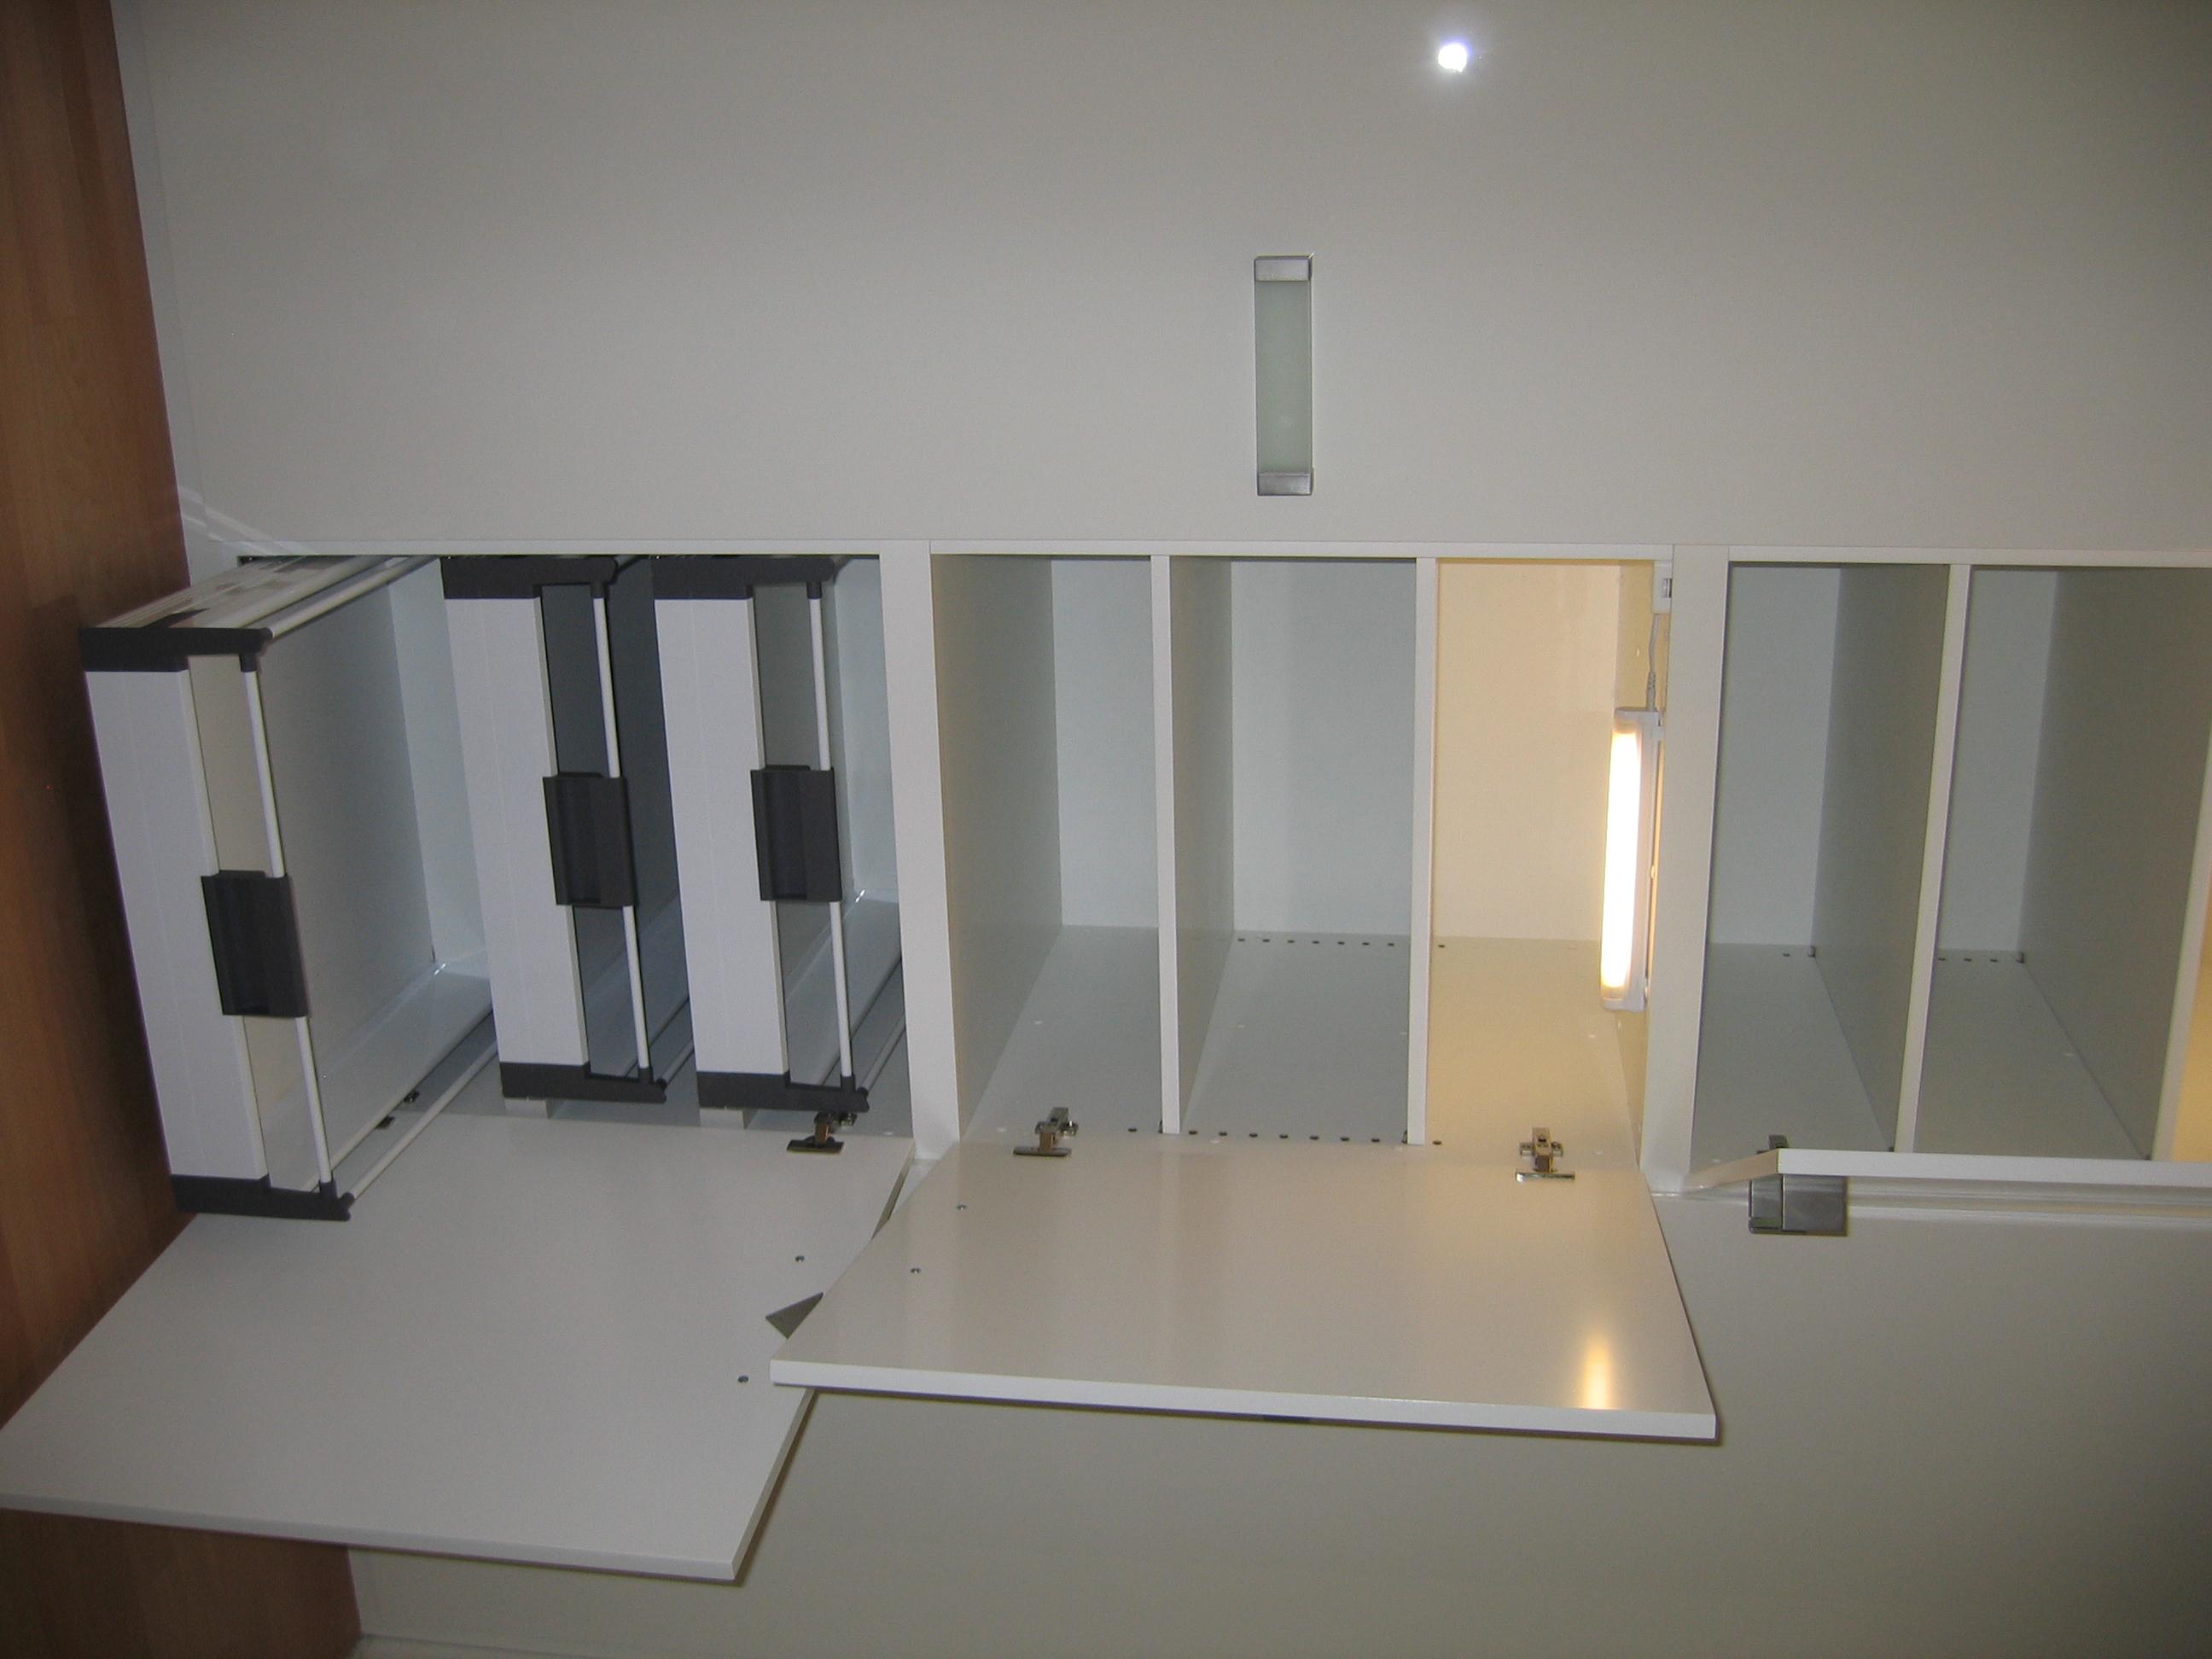 verstelbare planken en lades, verlichte kastbinnenzijde